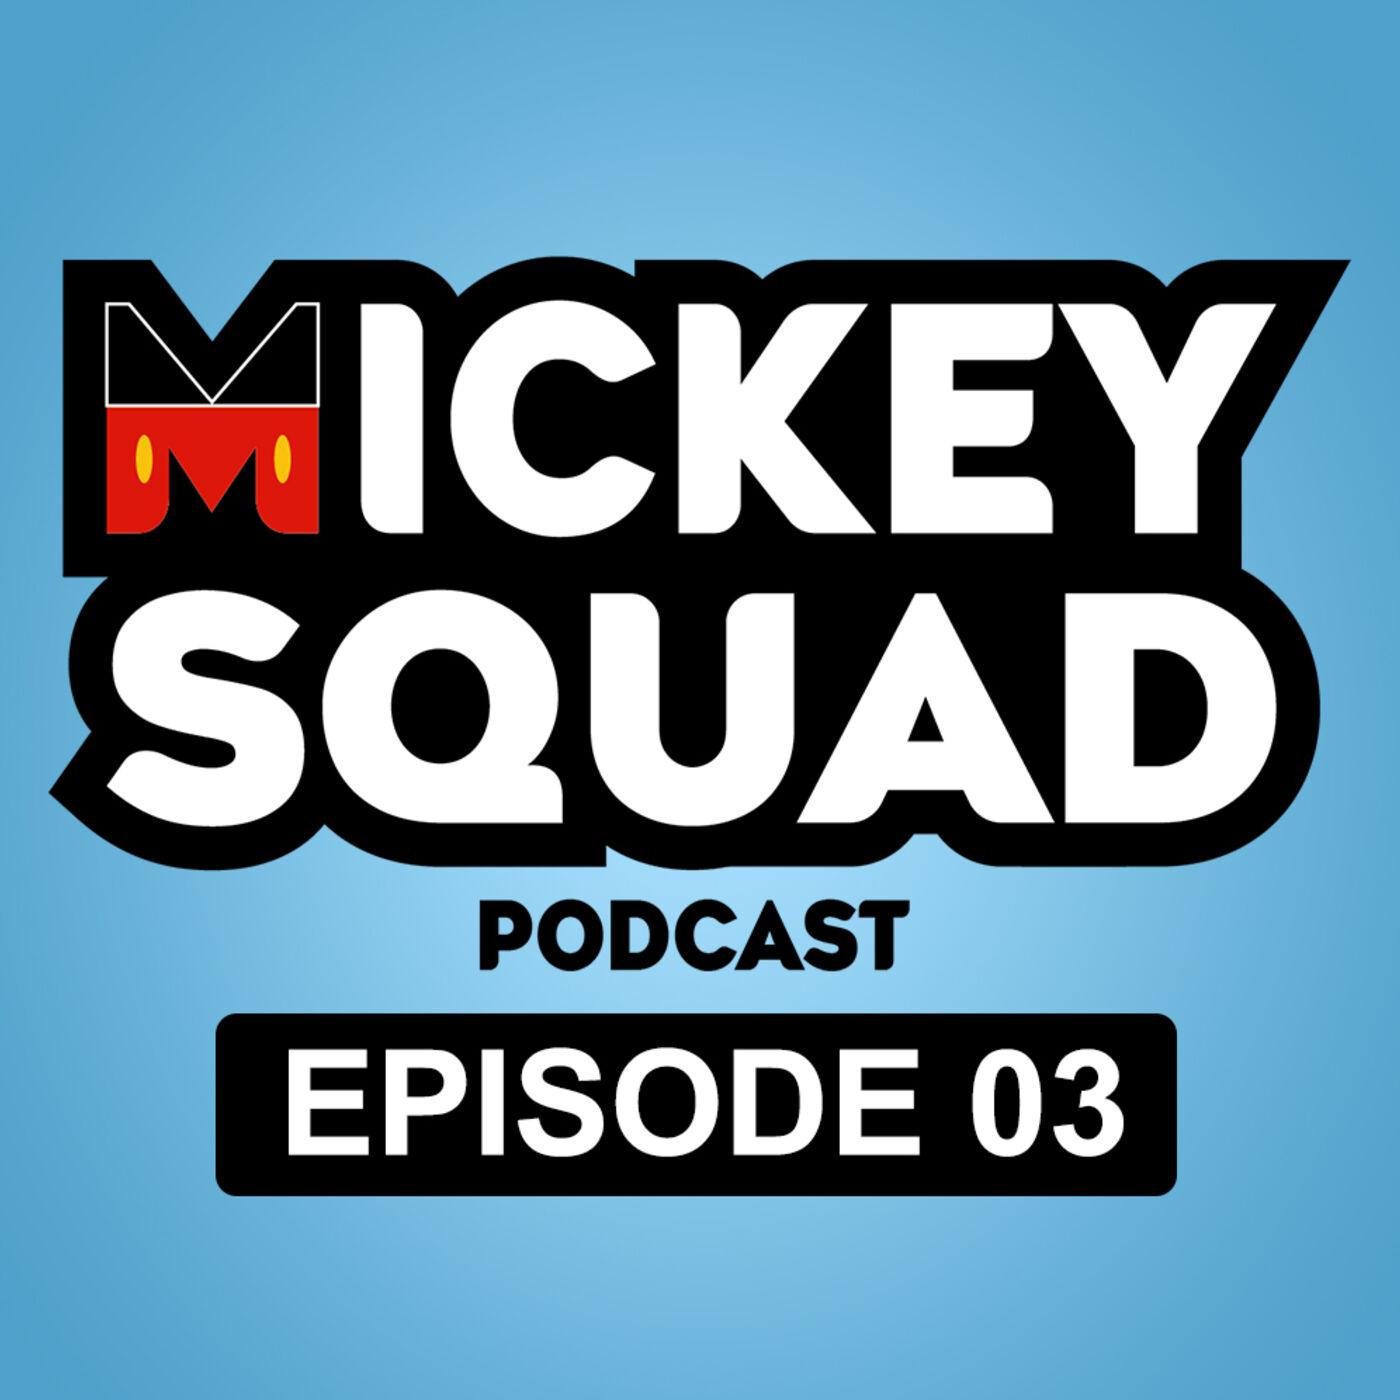 Episode 03 - Extreme Makeover Disneyland Editon